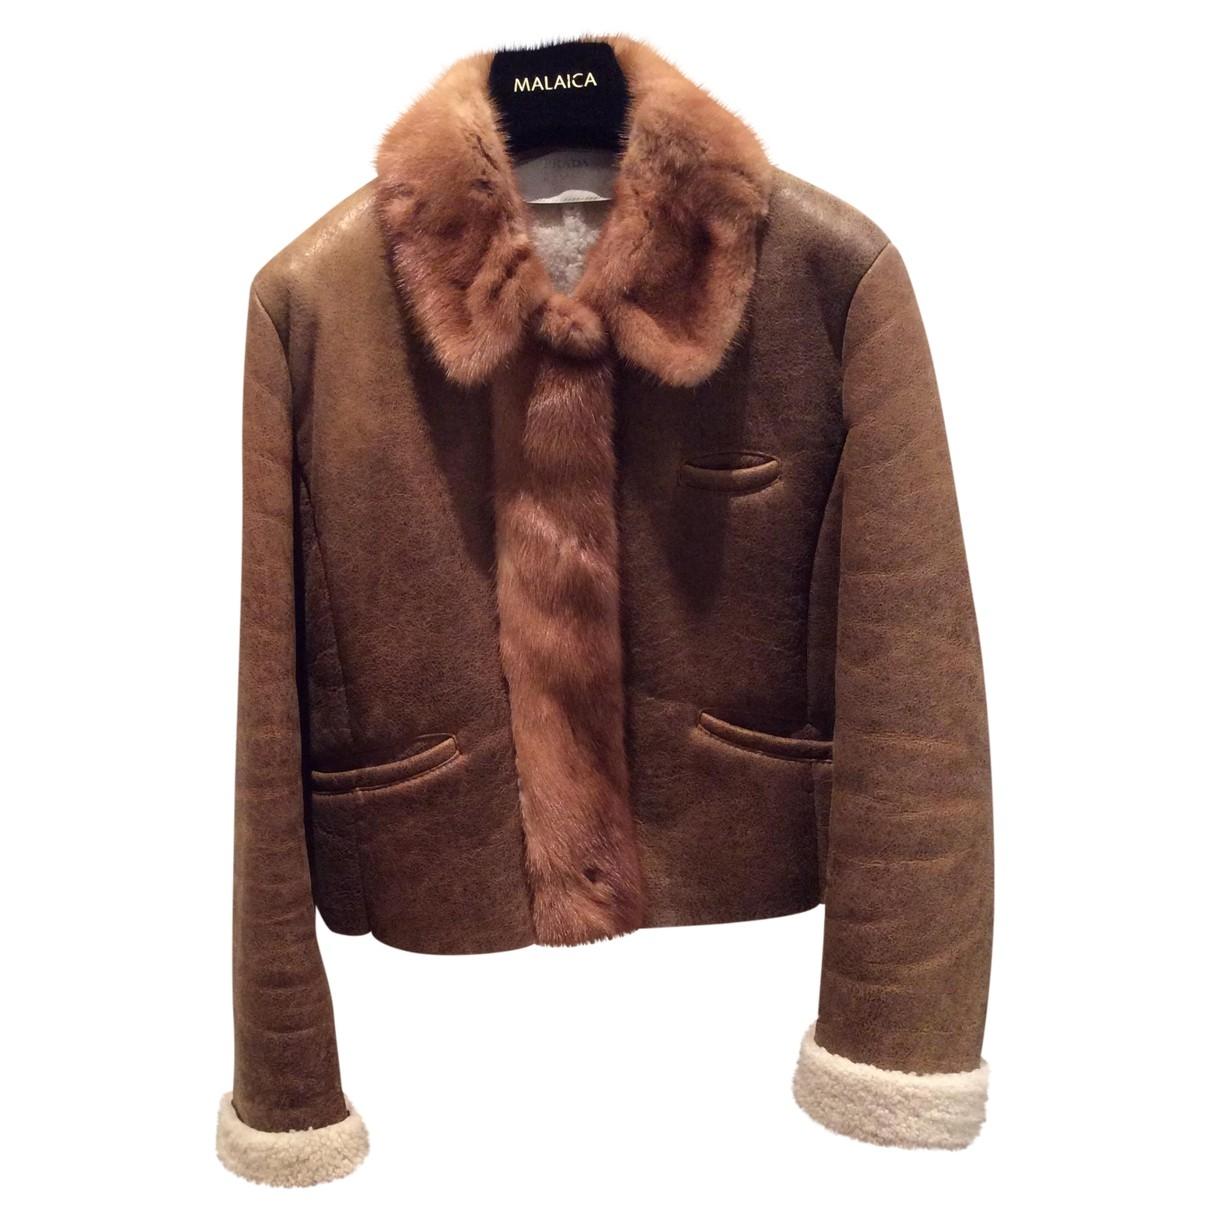 Prada \N Camel Shearling jacket for Women 44 IT